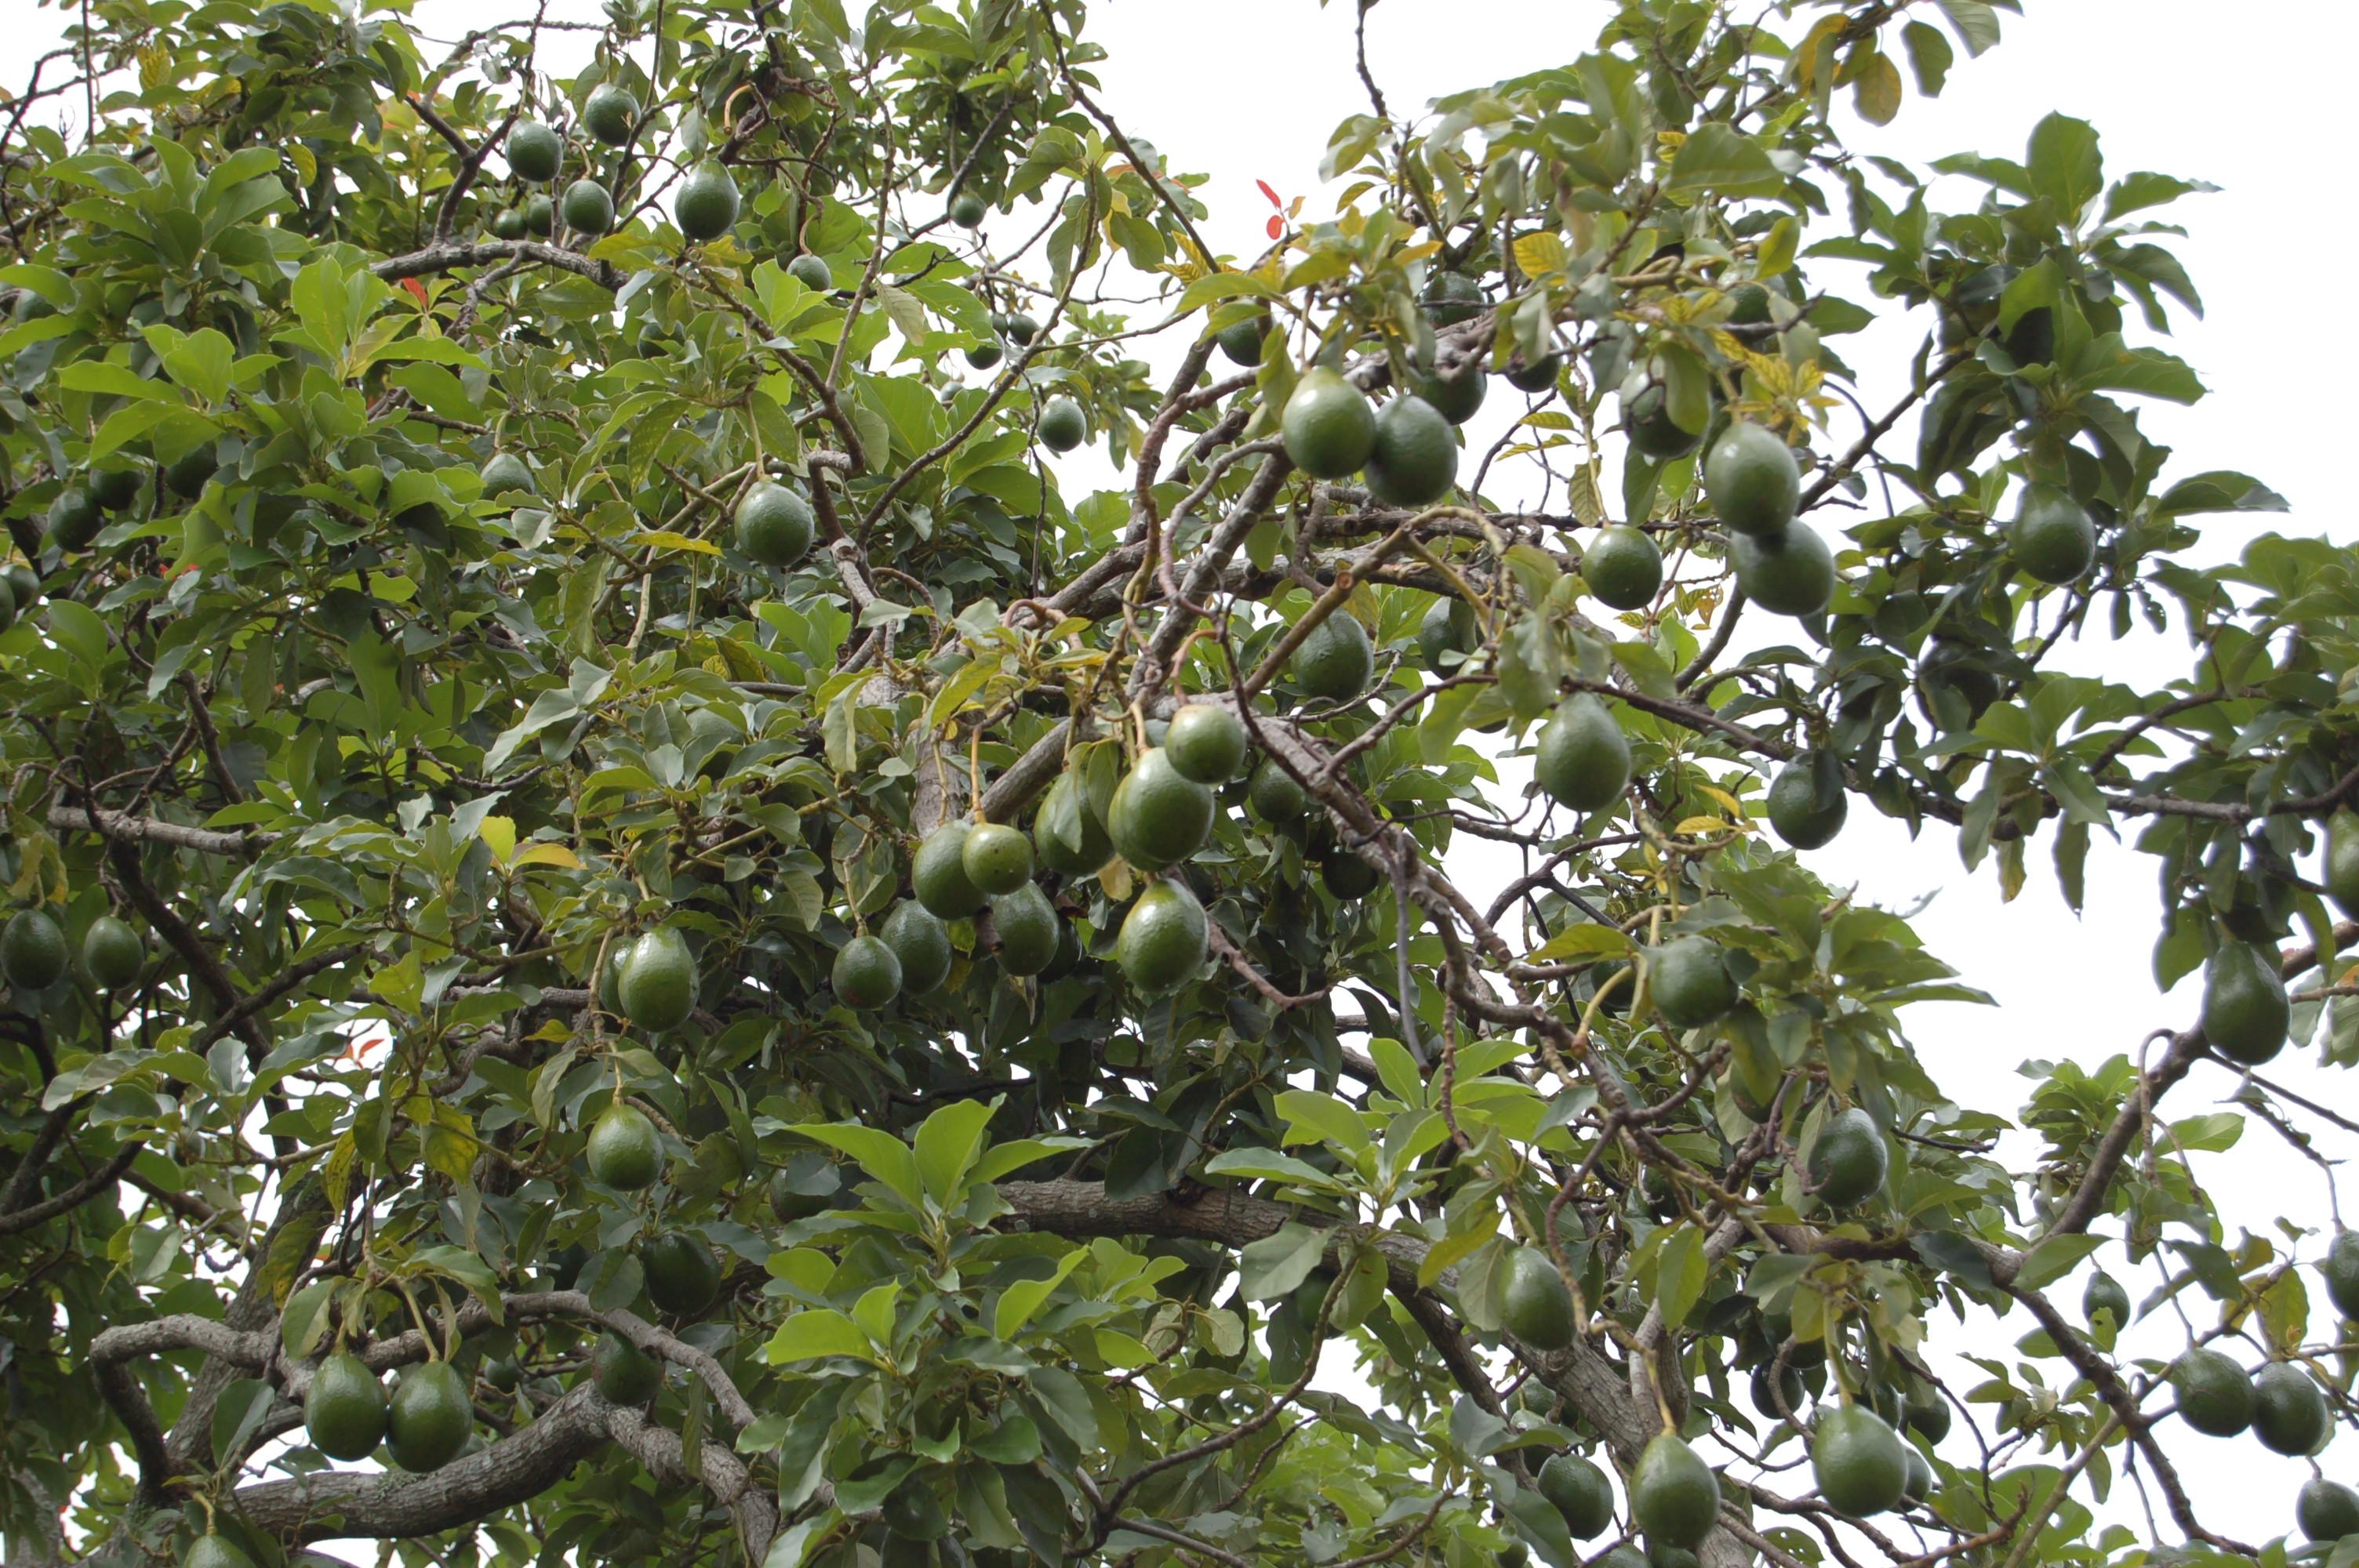 File:Avocado Tree (2473587957).jpg - Wikimedia Commons